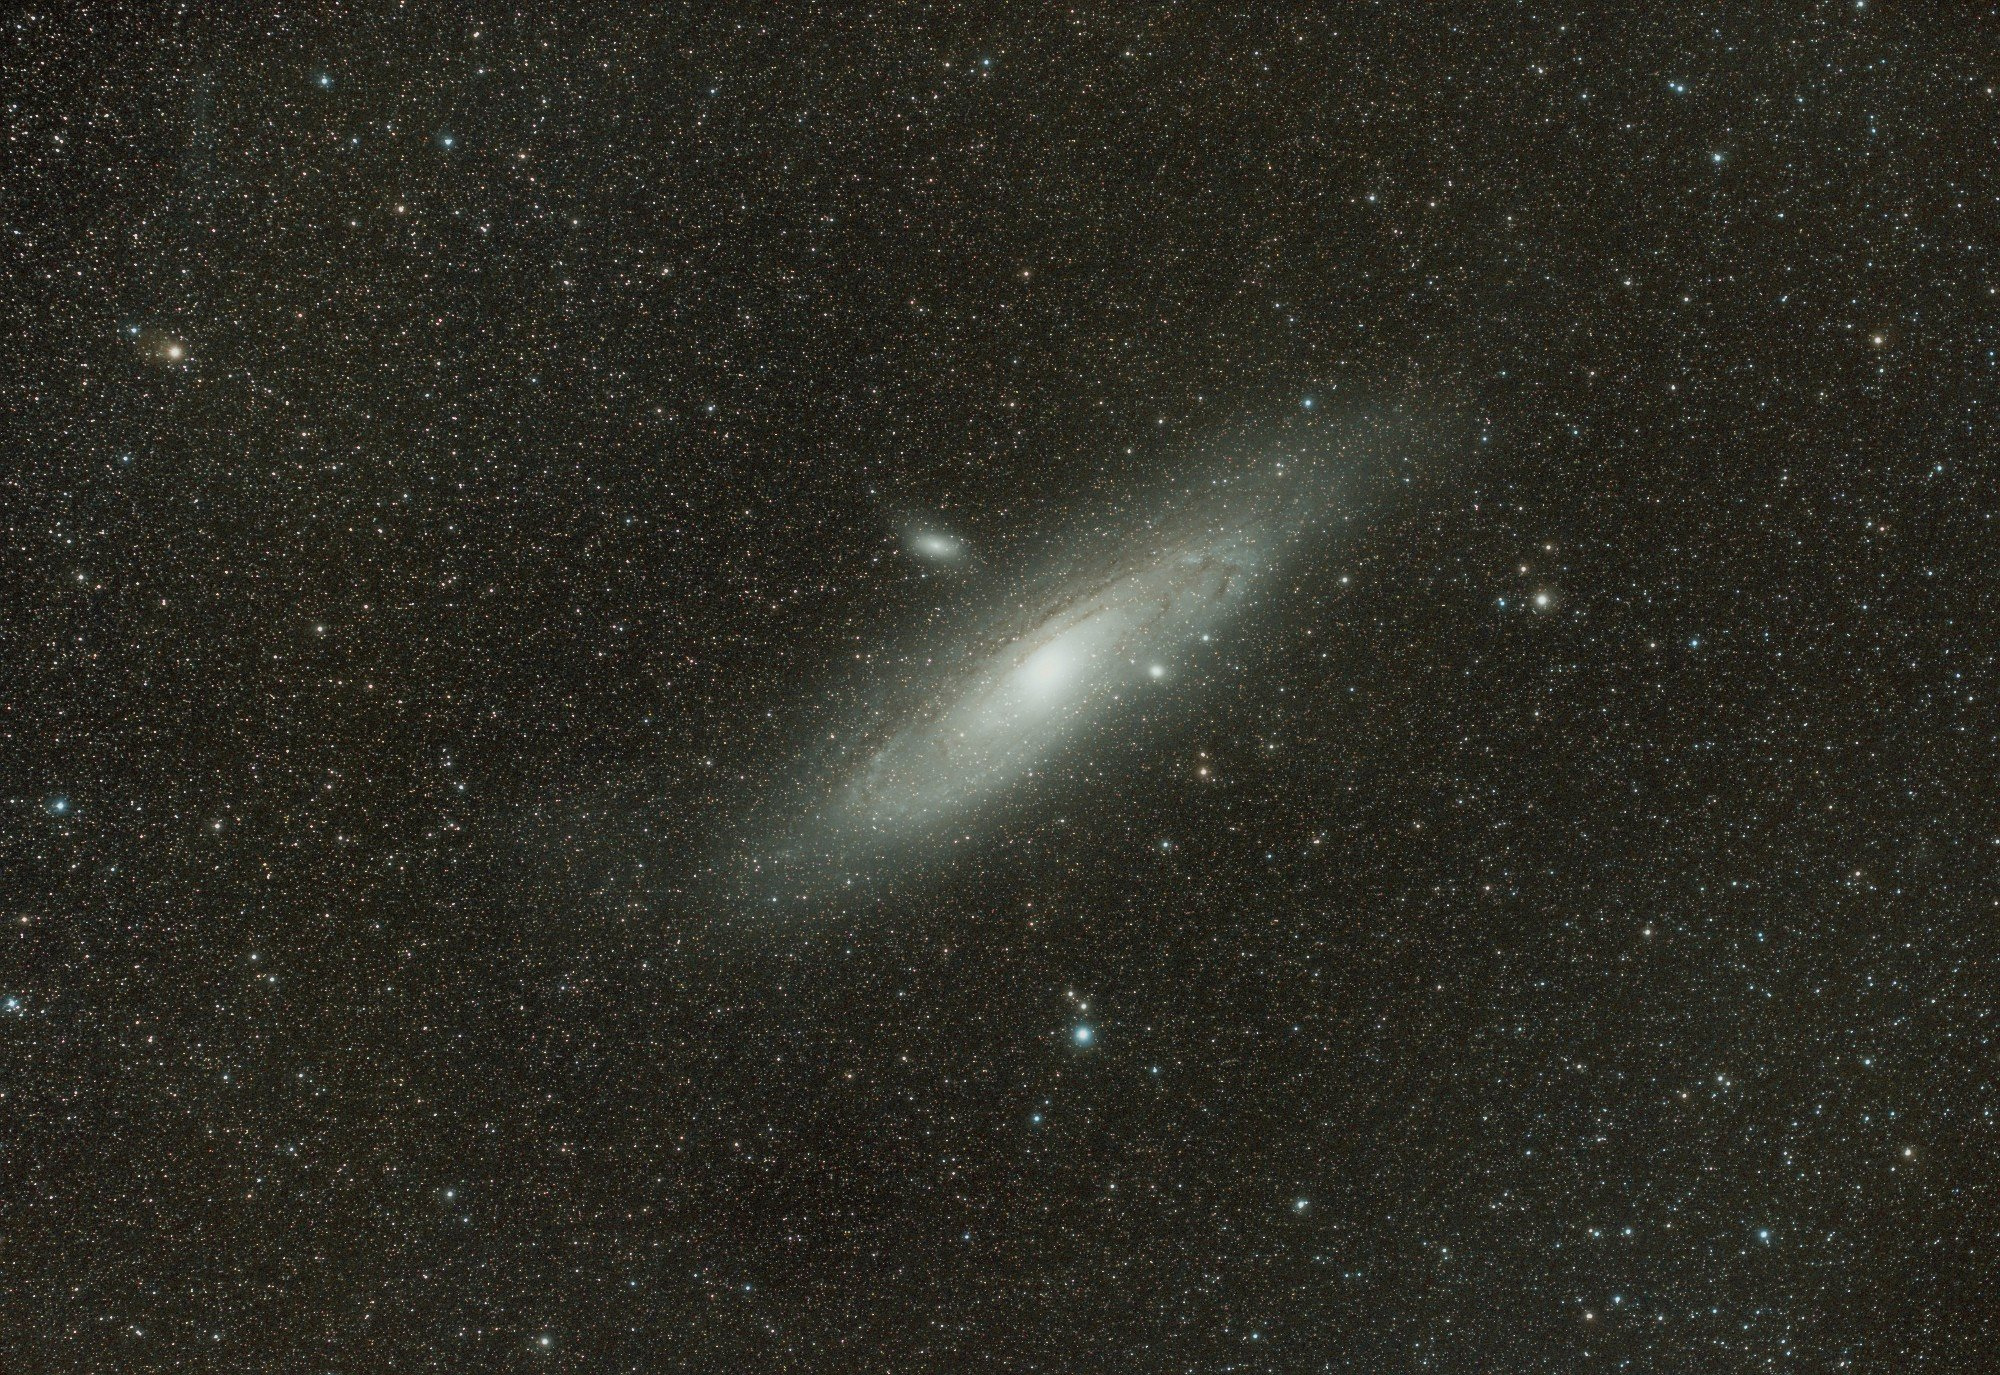 M31bis.thumb.jpg.a052e2f7c16d419e5dd3f9cb09ca1627_2scnr.jpg.20b5b2ea6b77ba94a47dd62ef3f7a2aa.jpg